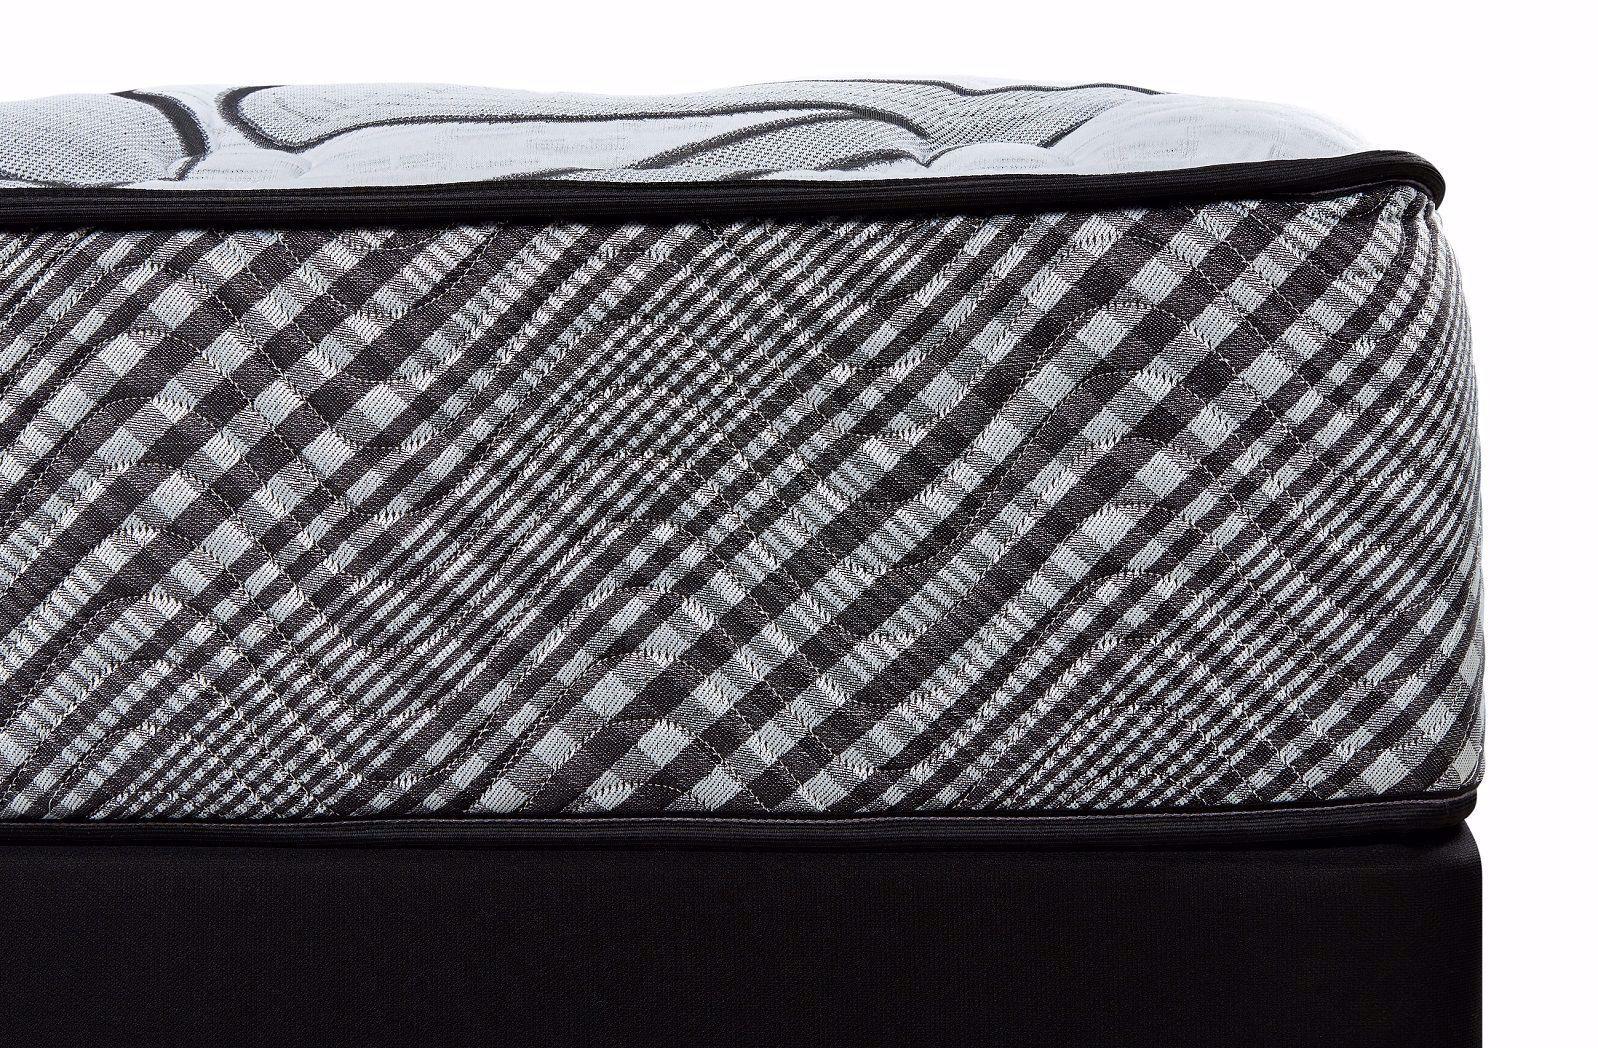 Picture of Restonic Darlington Plush Full Mattress Set